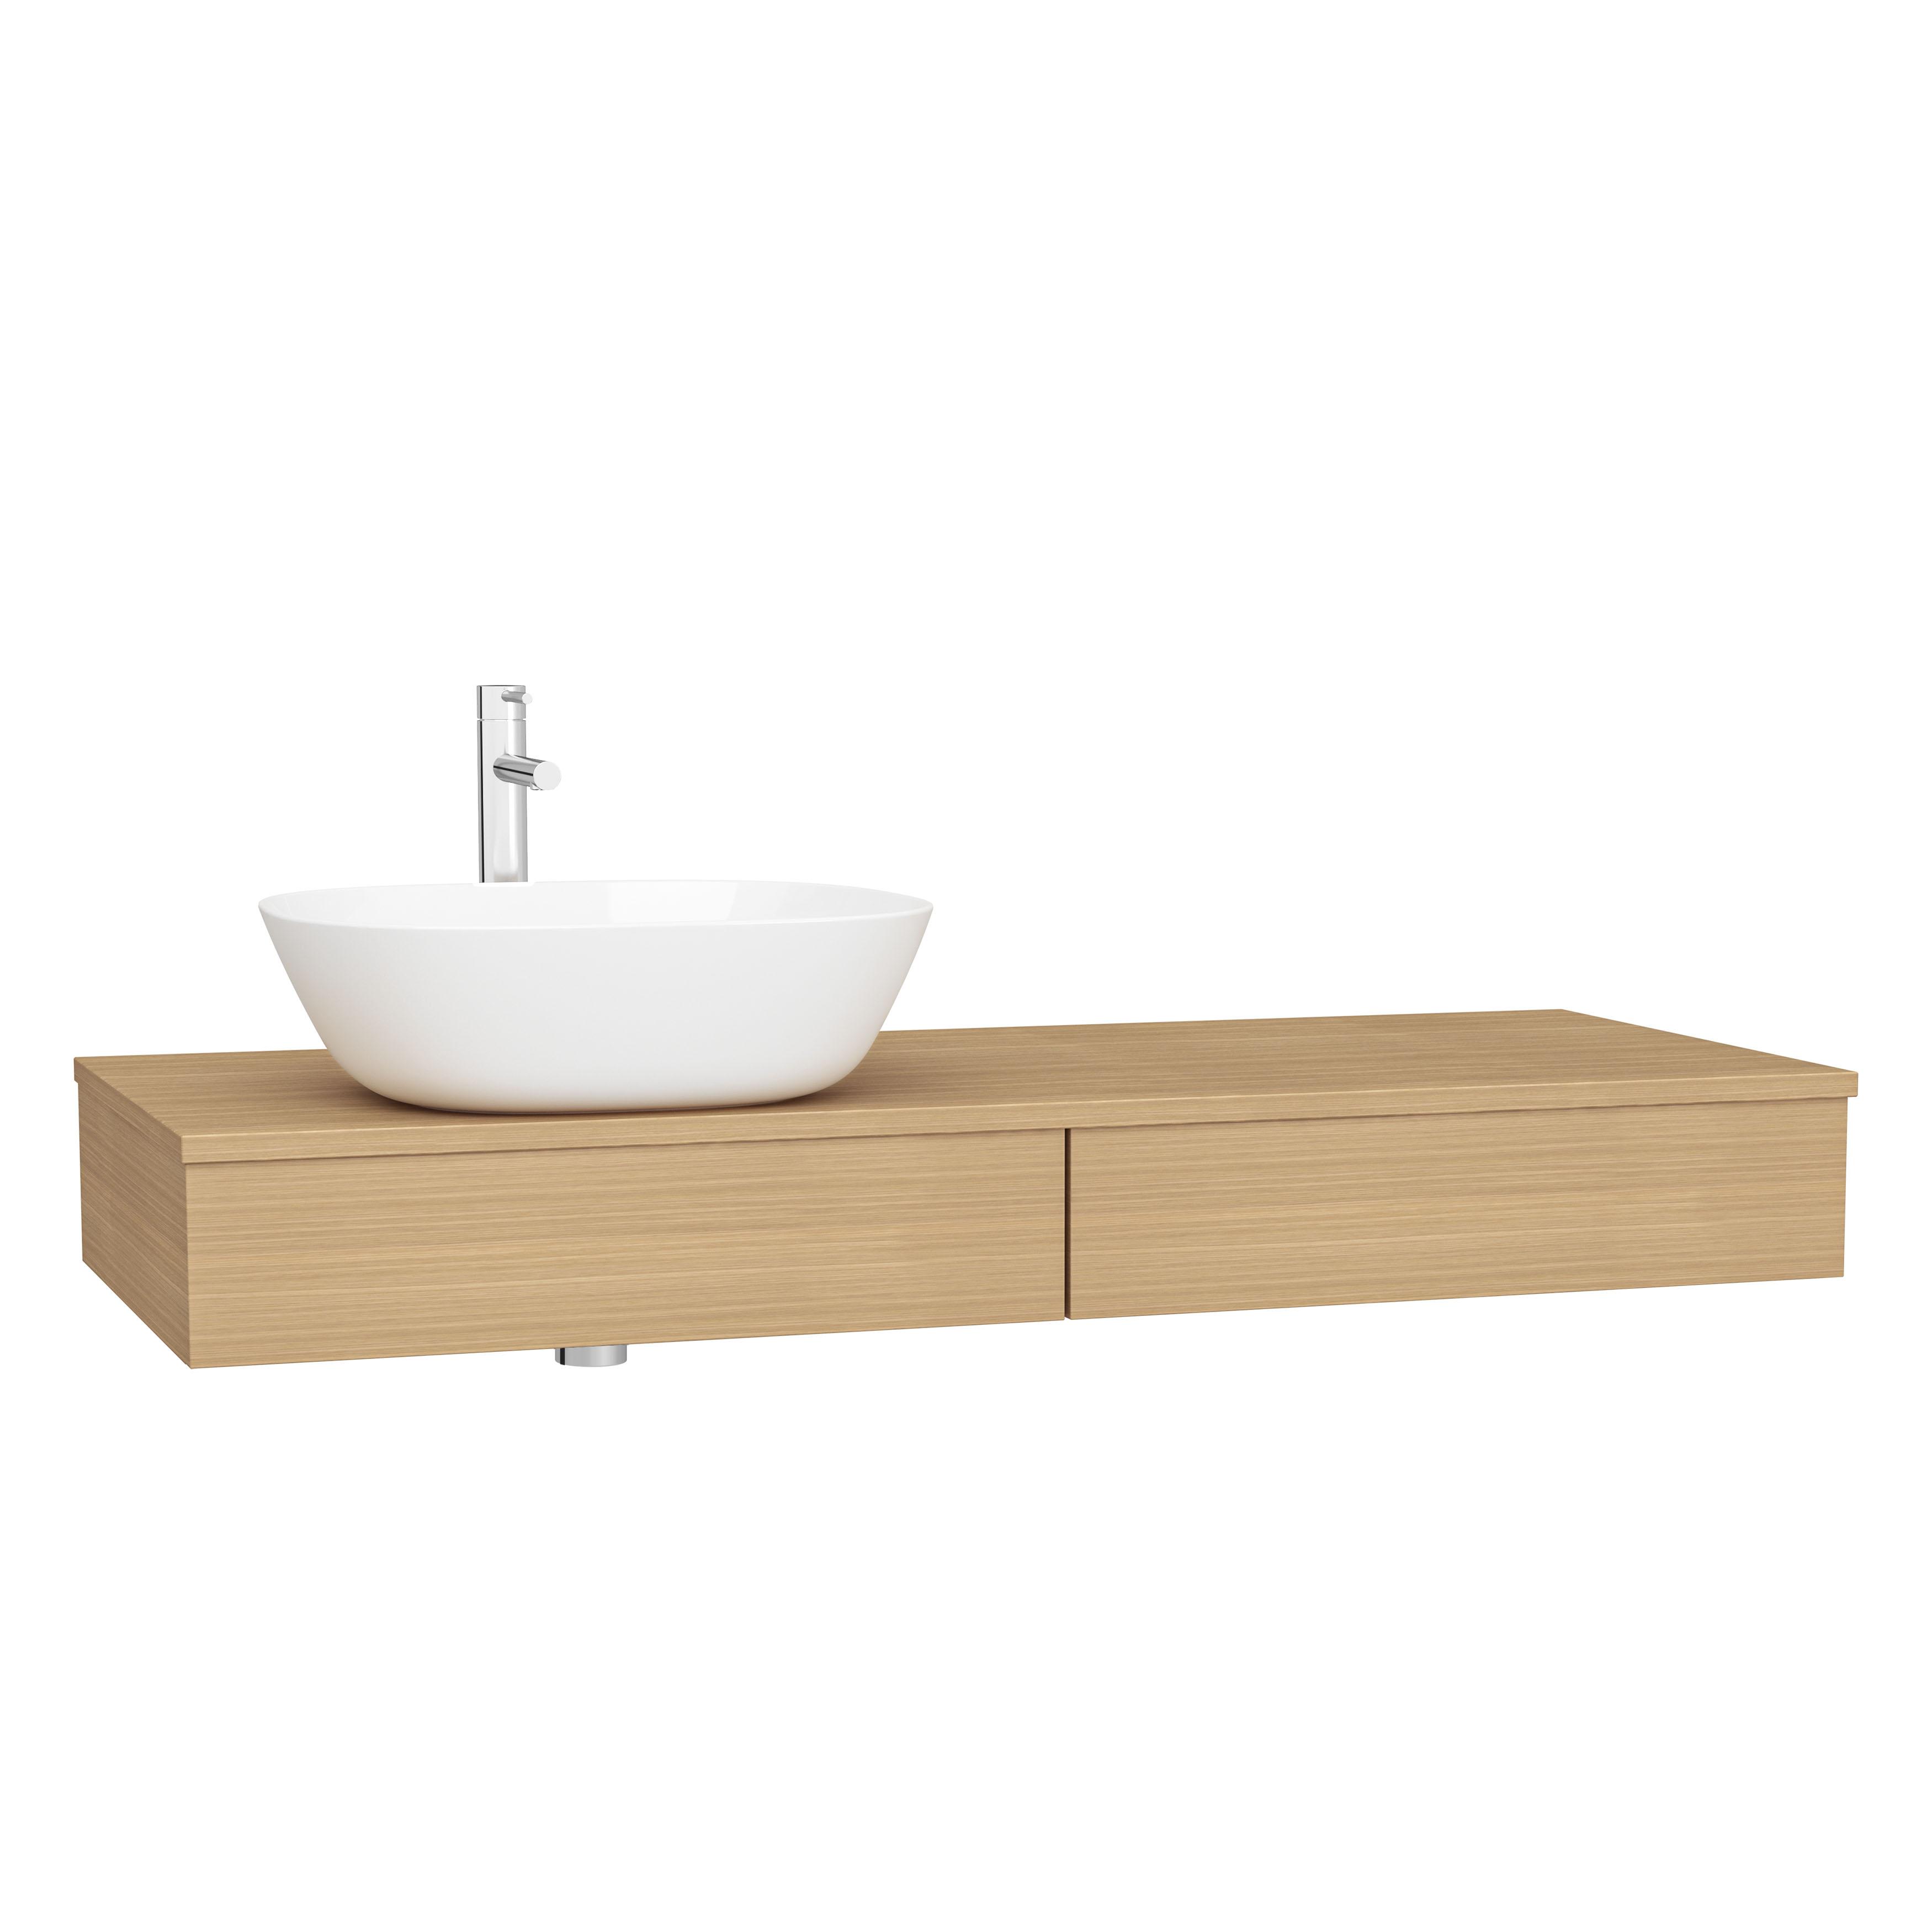 Origin plan de toilette avec tiroir, 120 cm, chêne ferrera, gauche